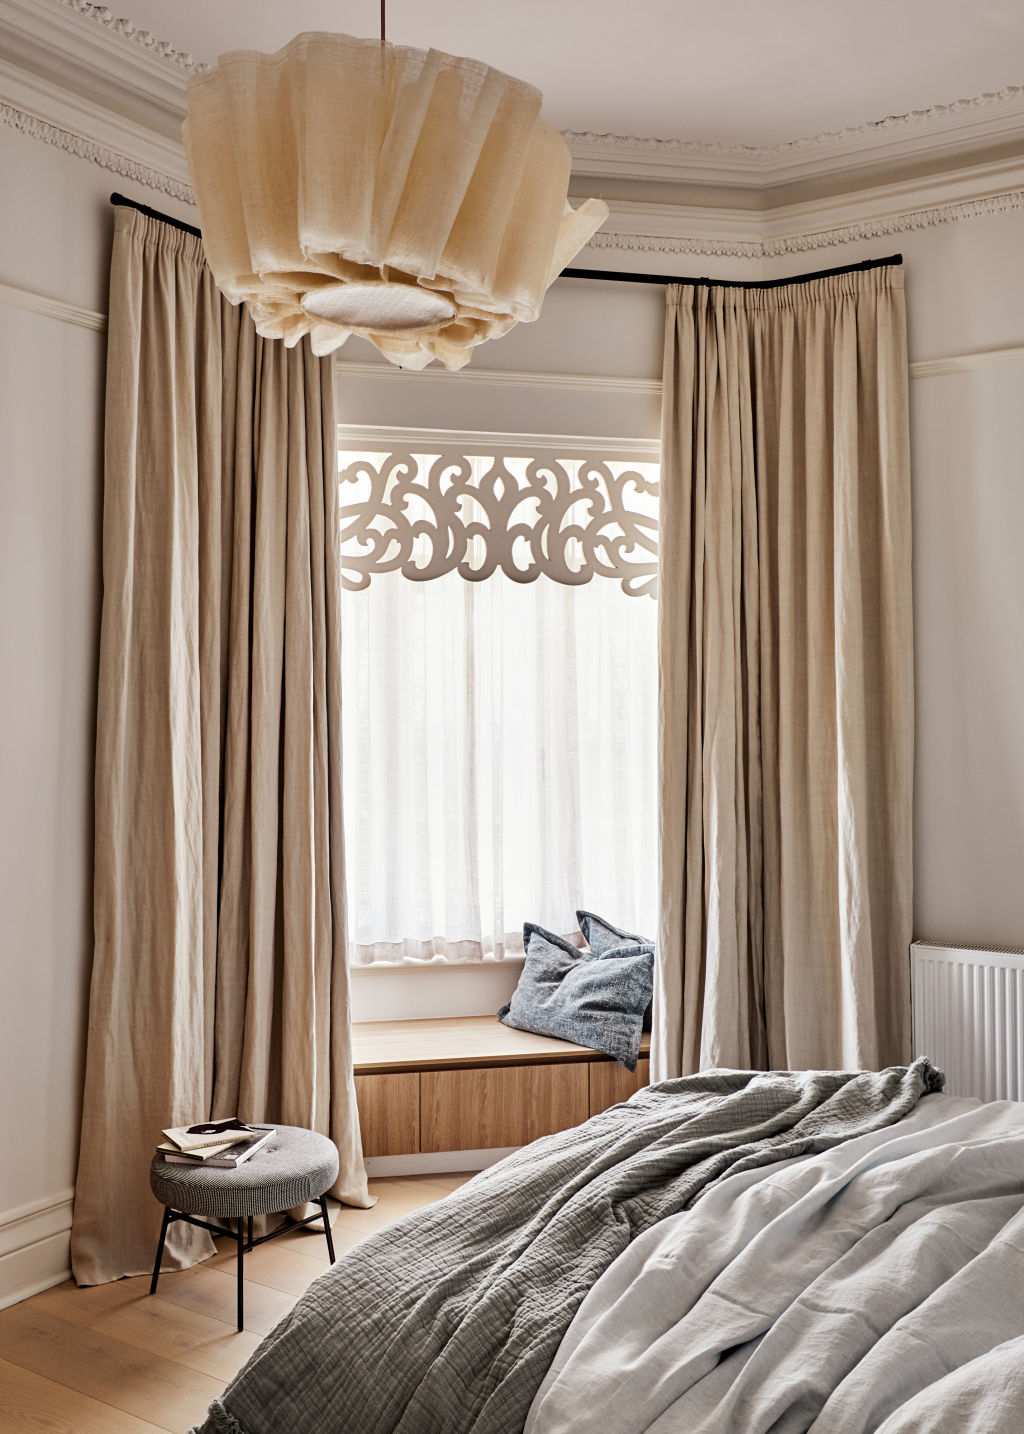 Malvern_East_House_by_Fiona_Lynch_Office_34_photographer_Amelia_Stanwix_1_njr9vg